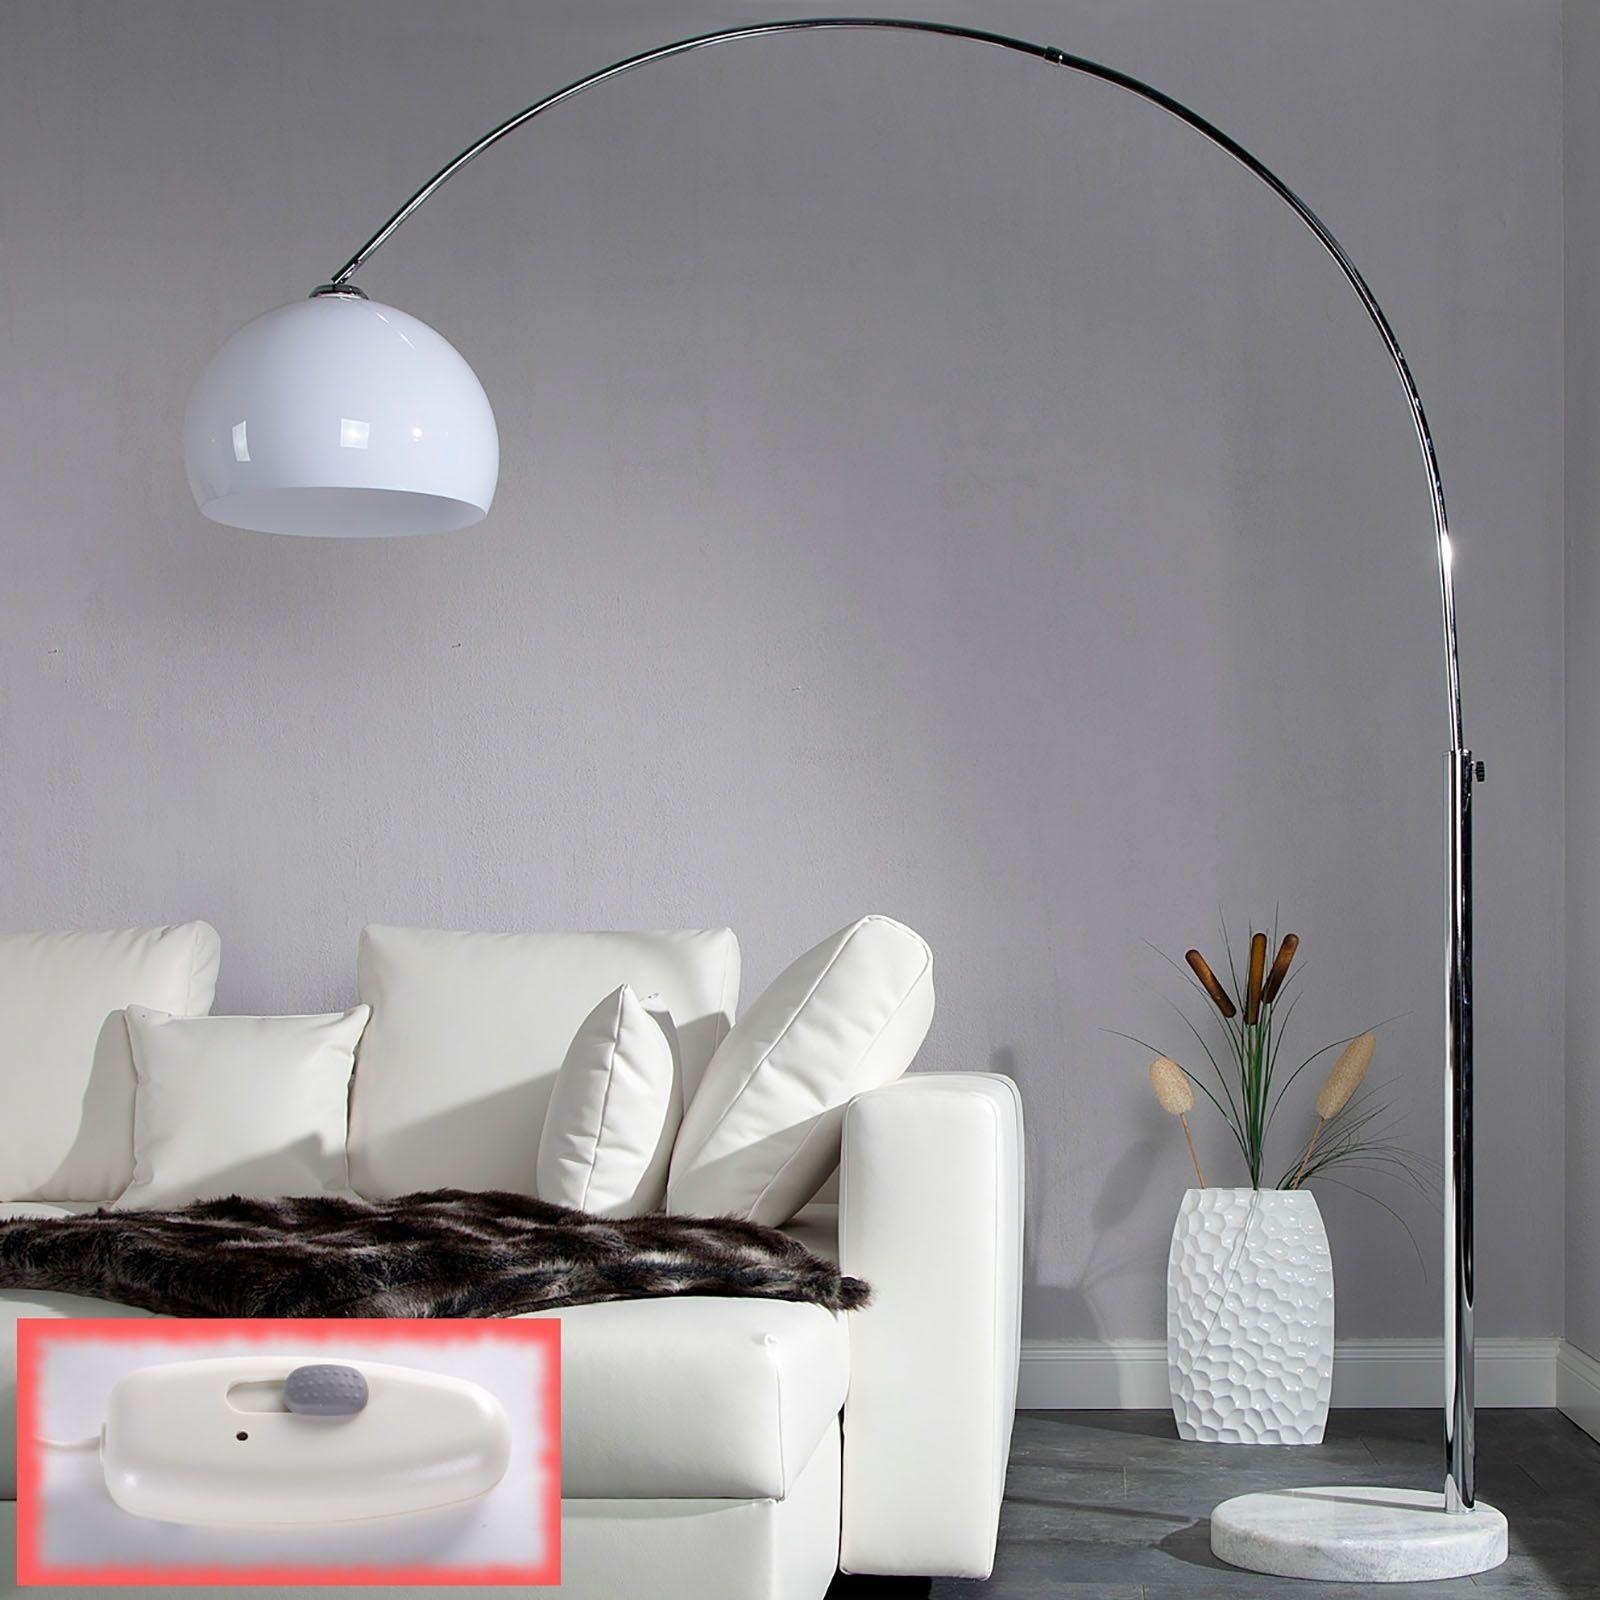 riesige designer bogenlampe big arc pro stehlampe dimmbar mit dimmer wei. Black Bedroom Furniture Sets. Home Design Ideas